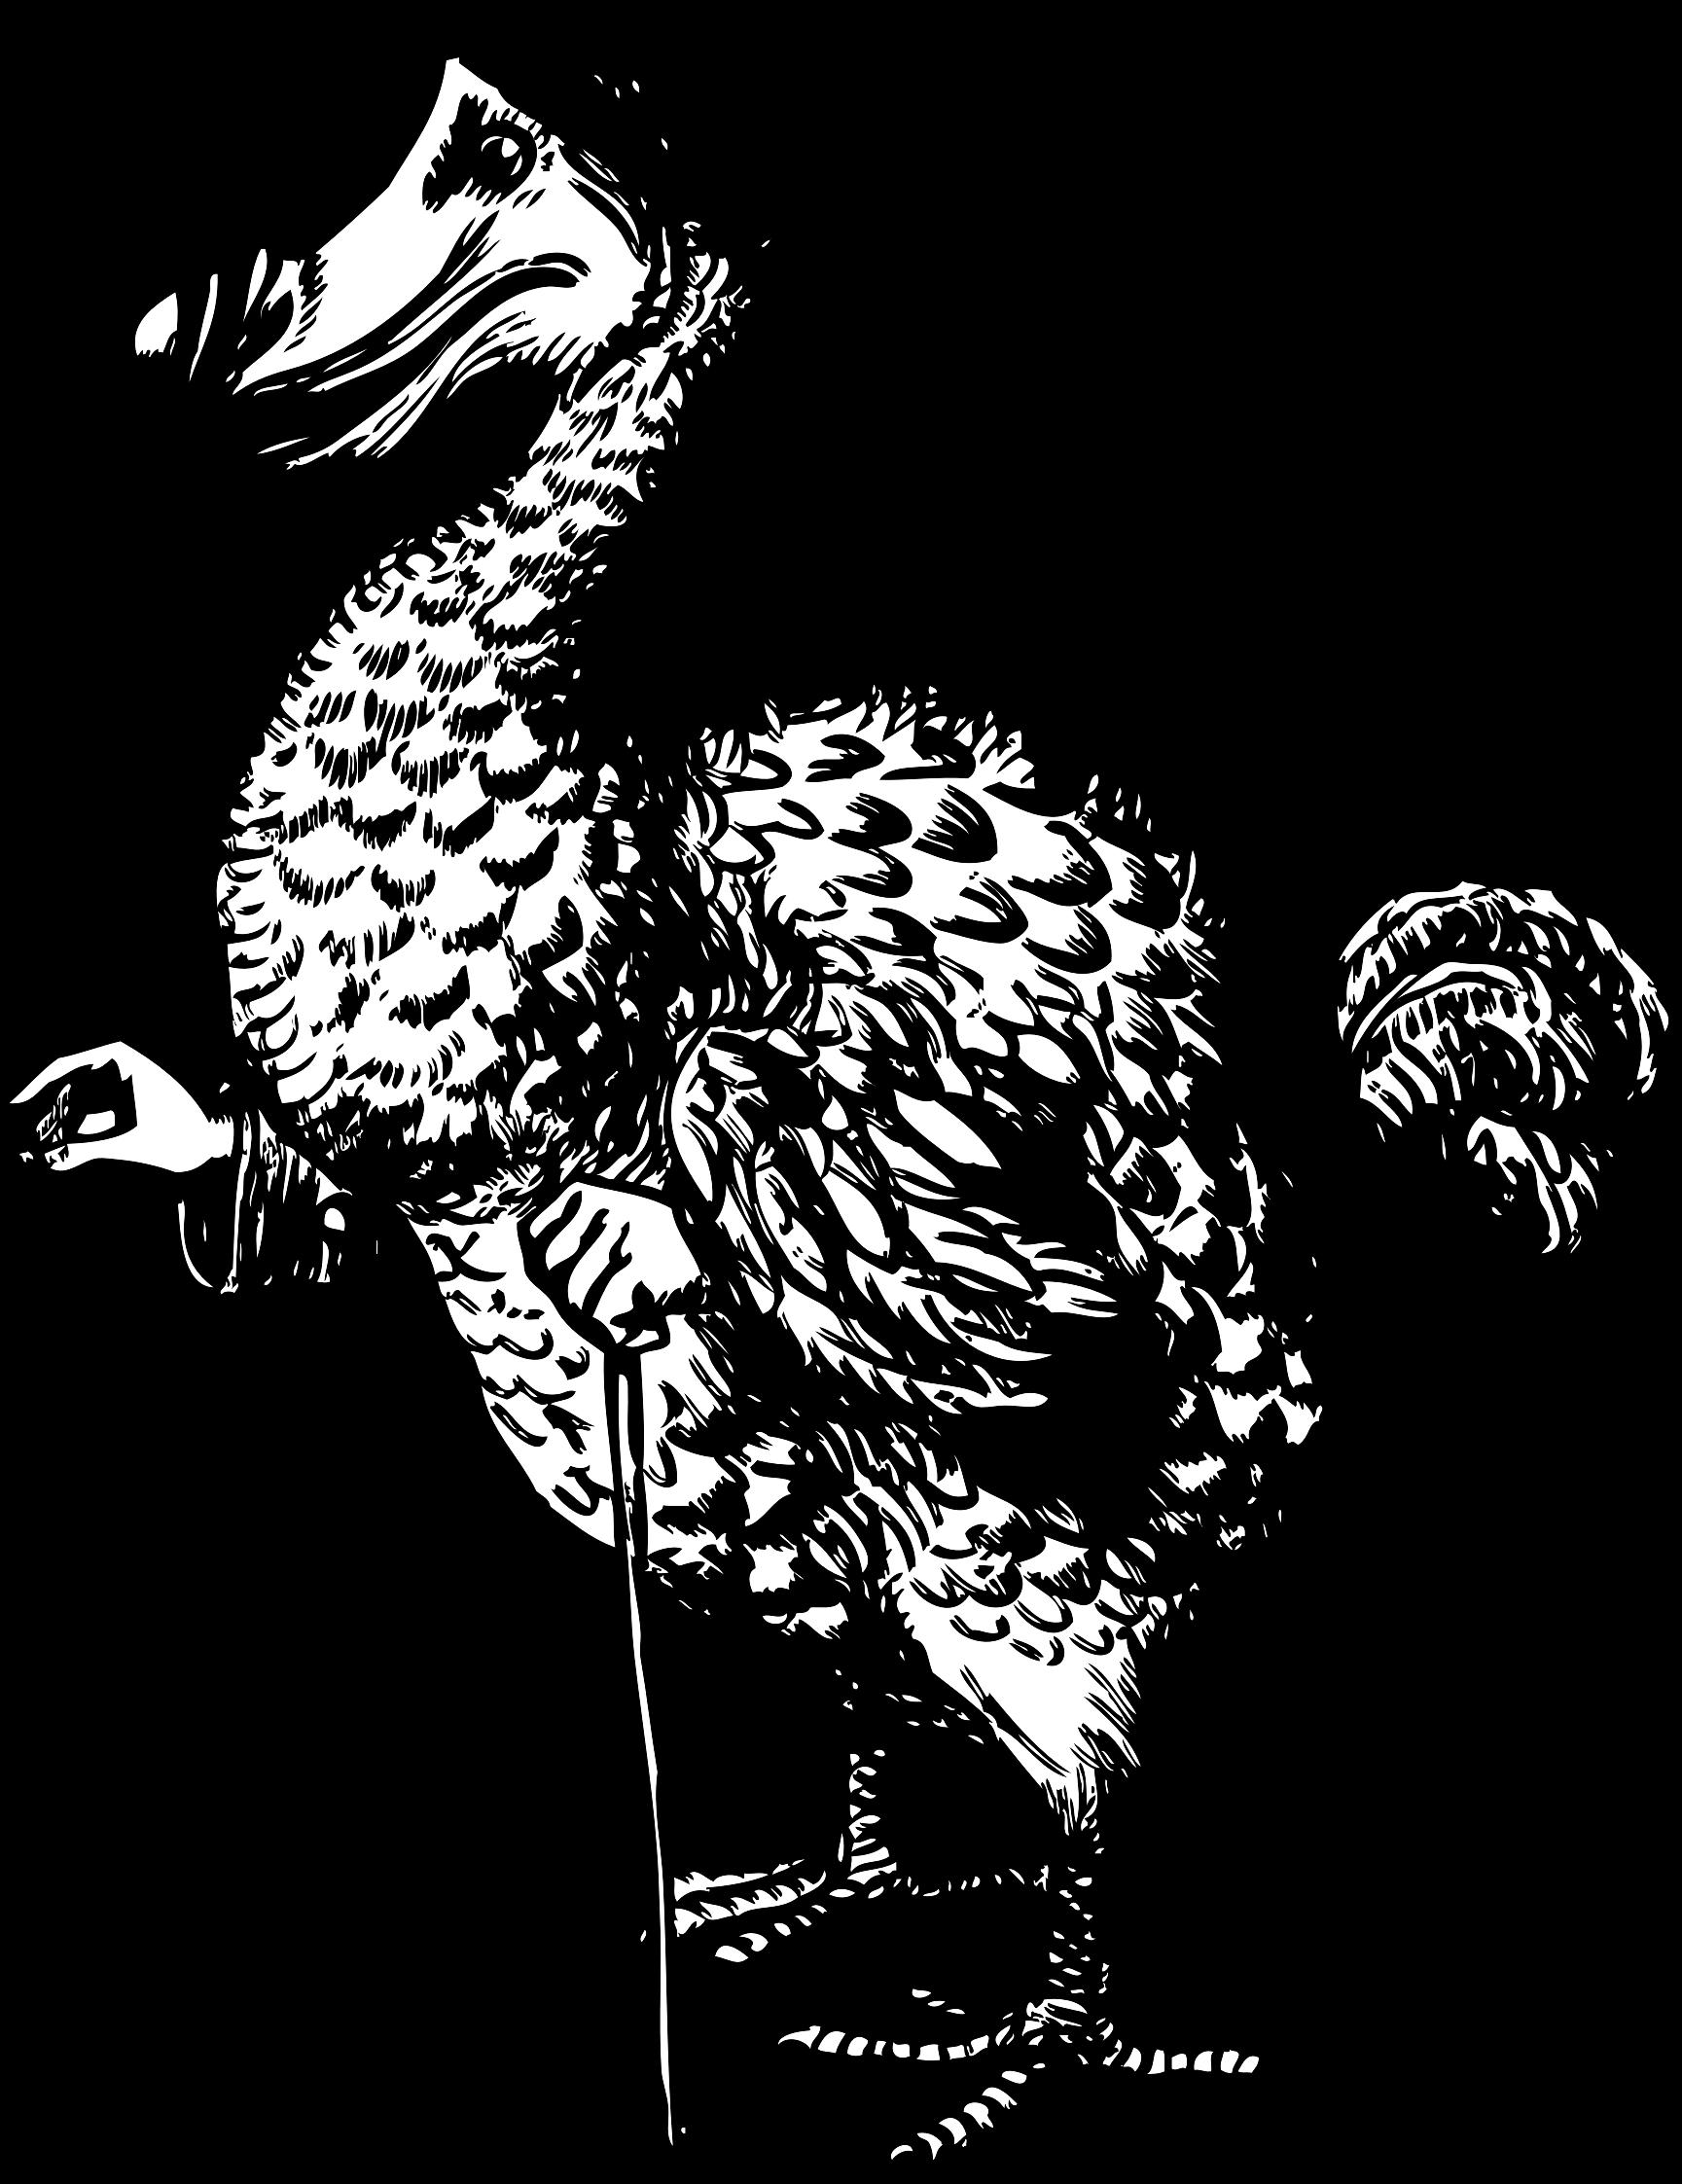 Alice in wonderland book clipart svg transparent stock Clipart - The Dodo from Alice in Wonderland svg transparent stock